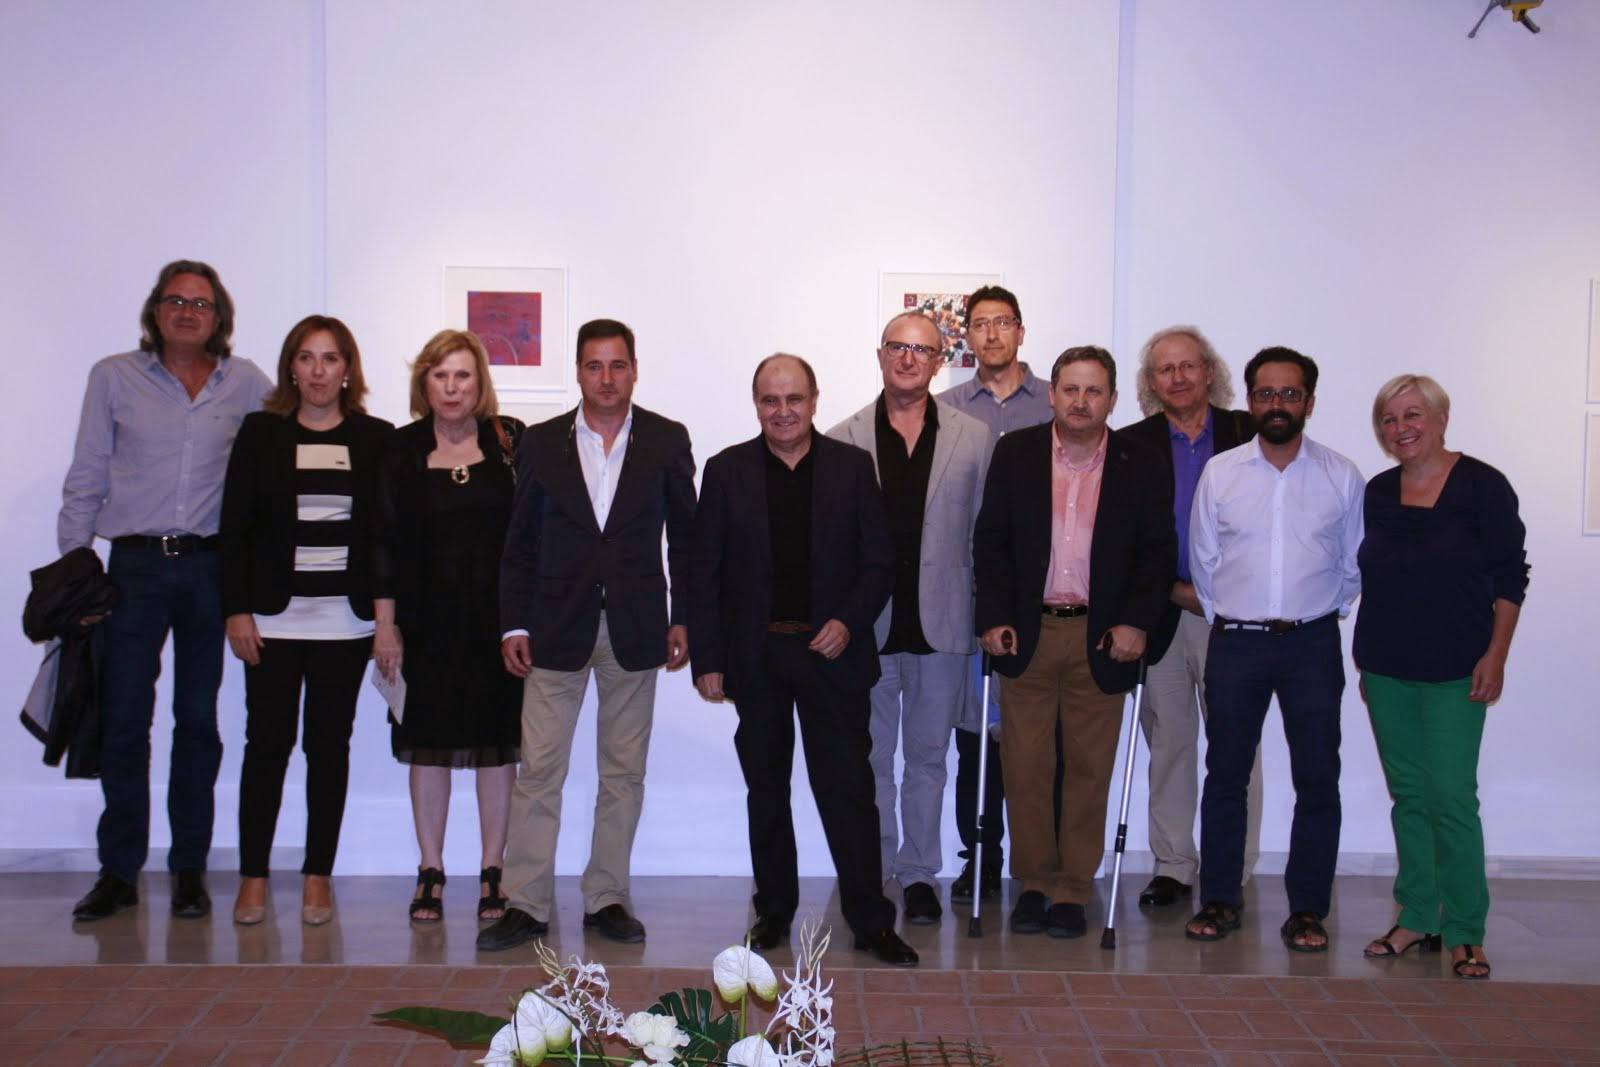 INAUGURACIÓN ARTE CISORIA EN CENTRE D'ART TALLER D'IVARS (BENISSA)